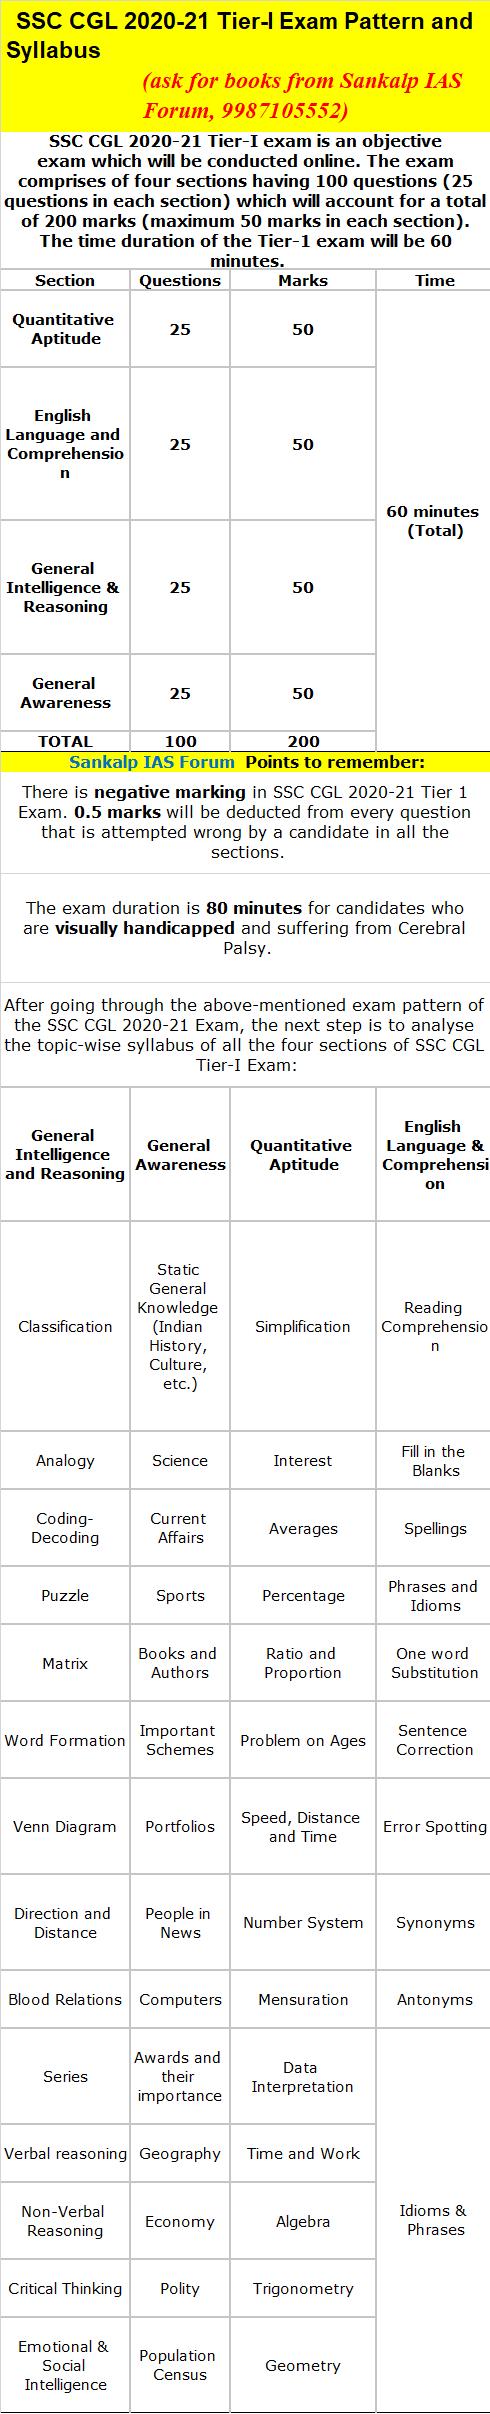 SSC pattern syllabus 2021.png